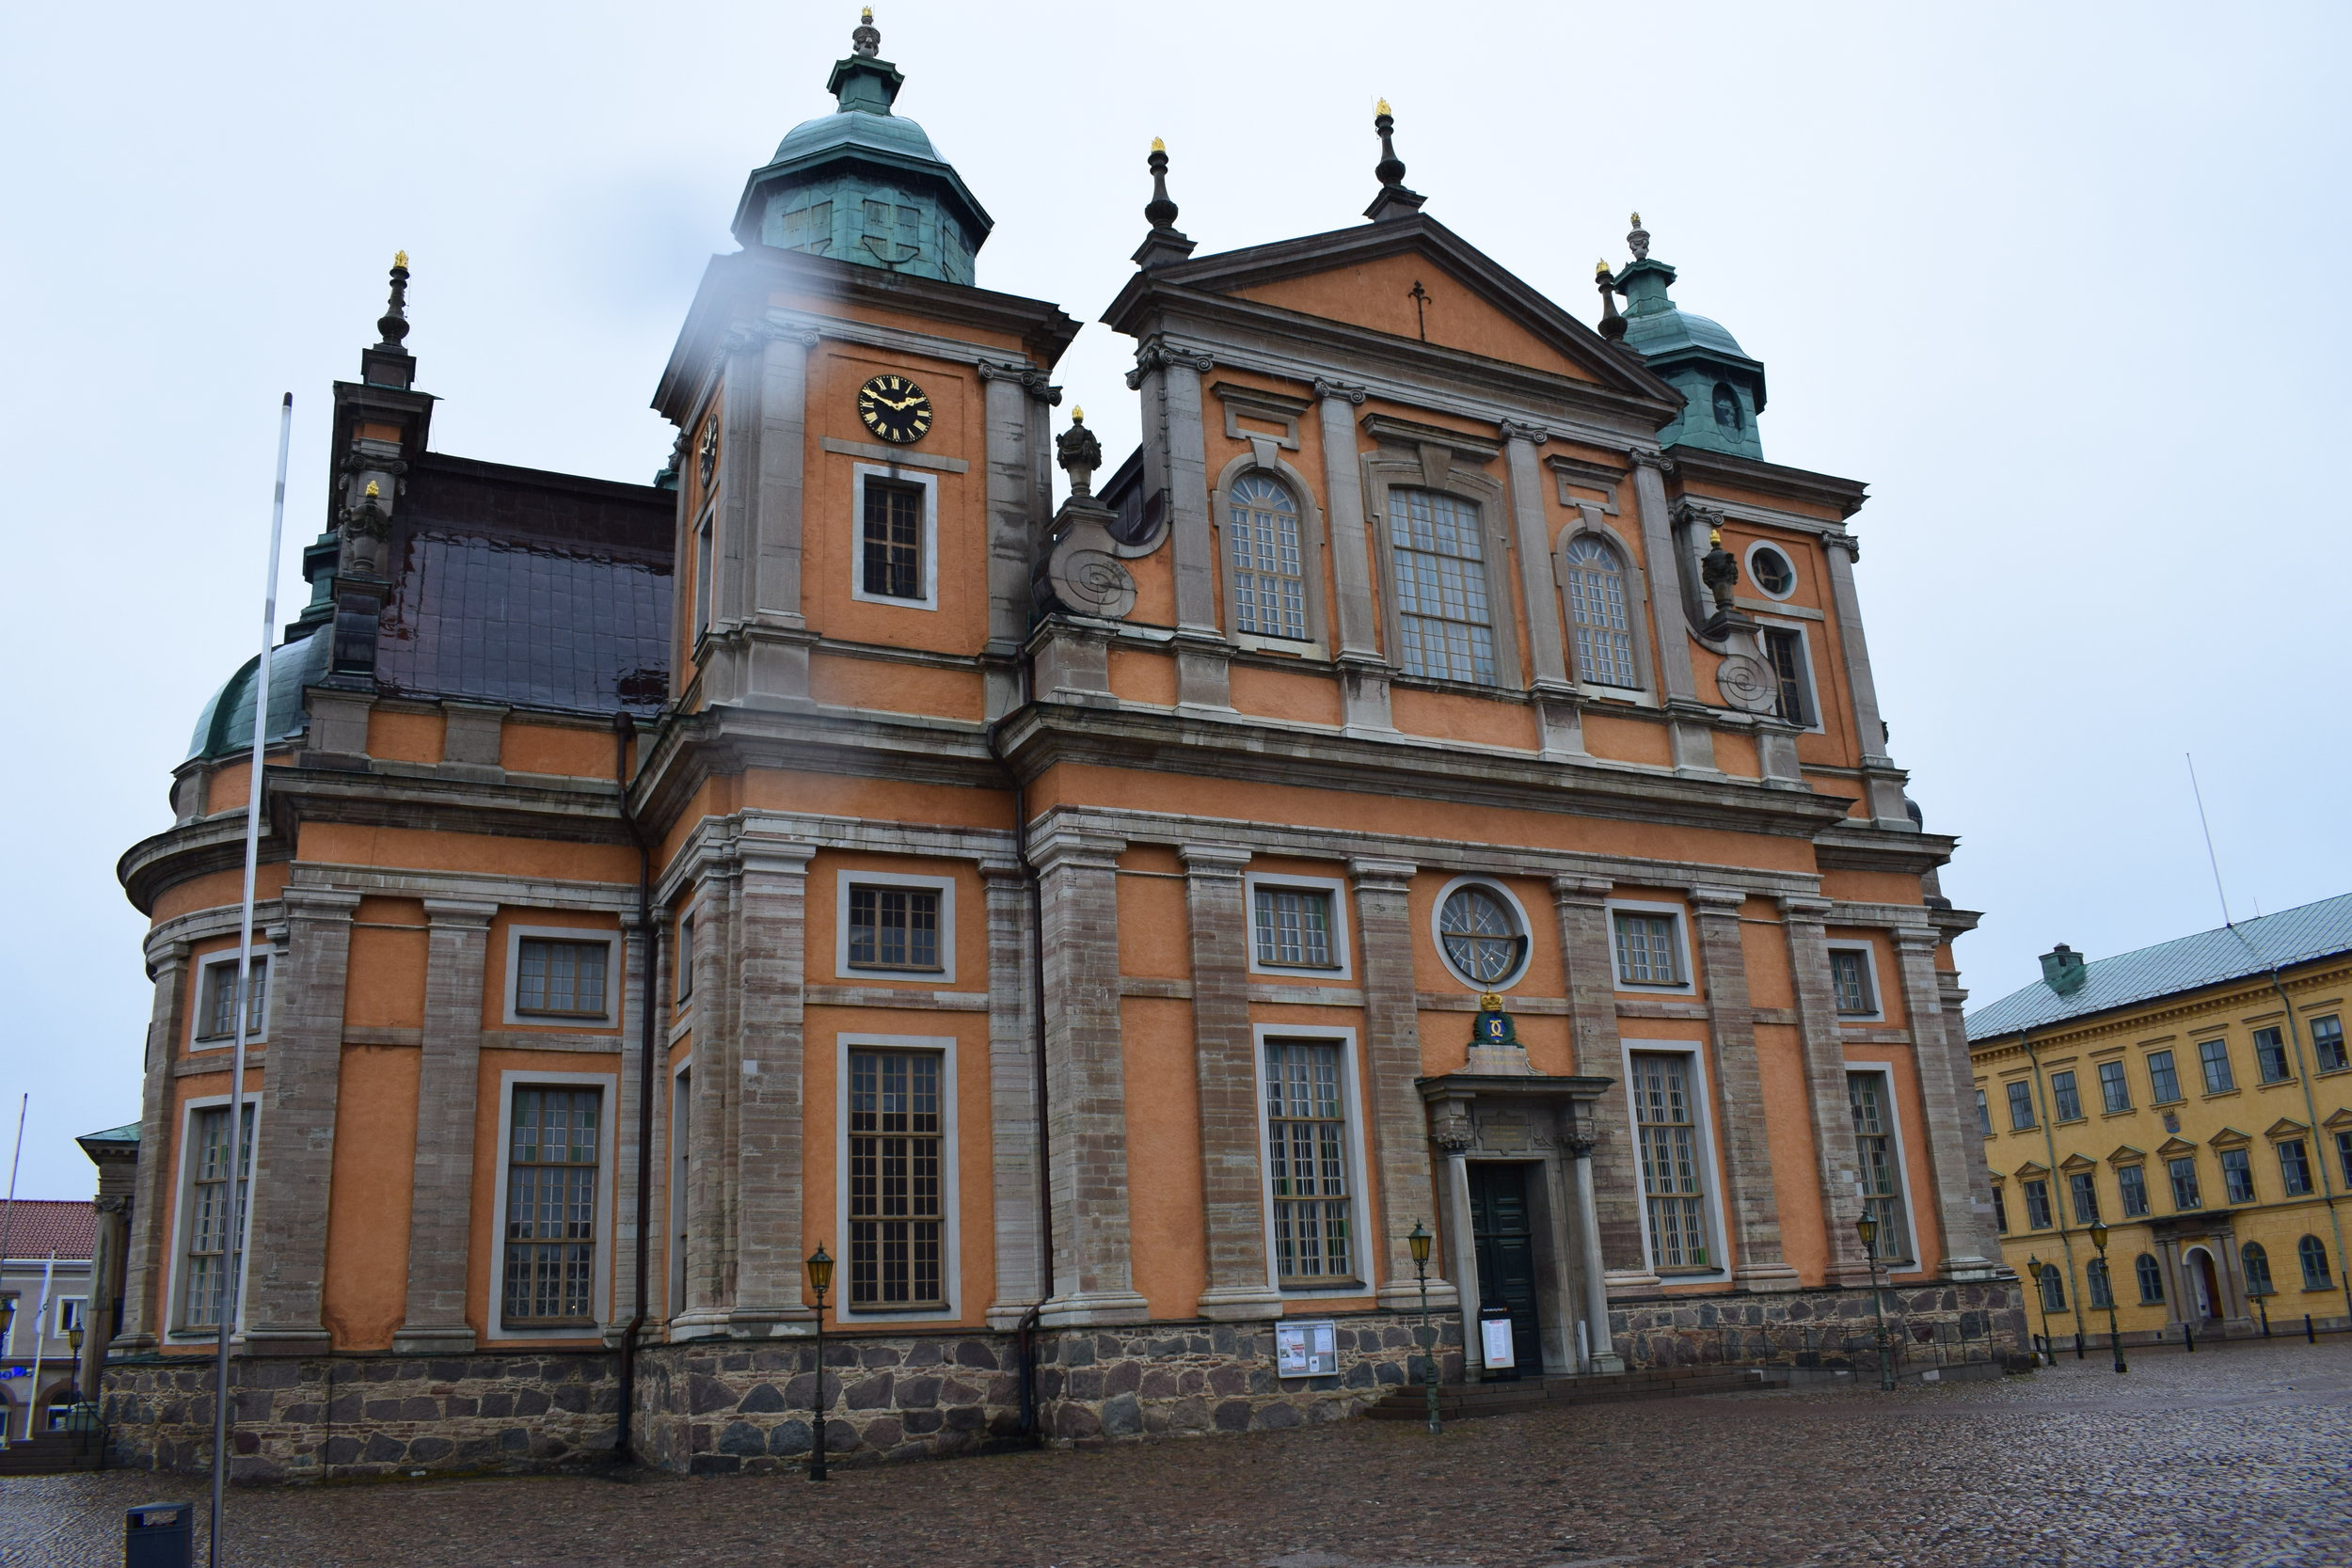 Nicodemus Tessin den äldre, Kalmar domkyrka (The Kalmar Cathedral), 1660-1682, Kalmar